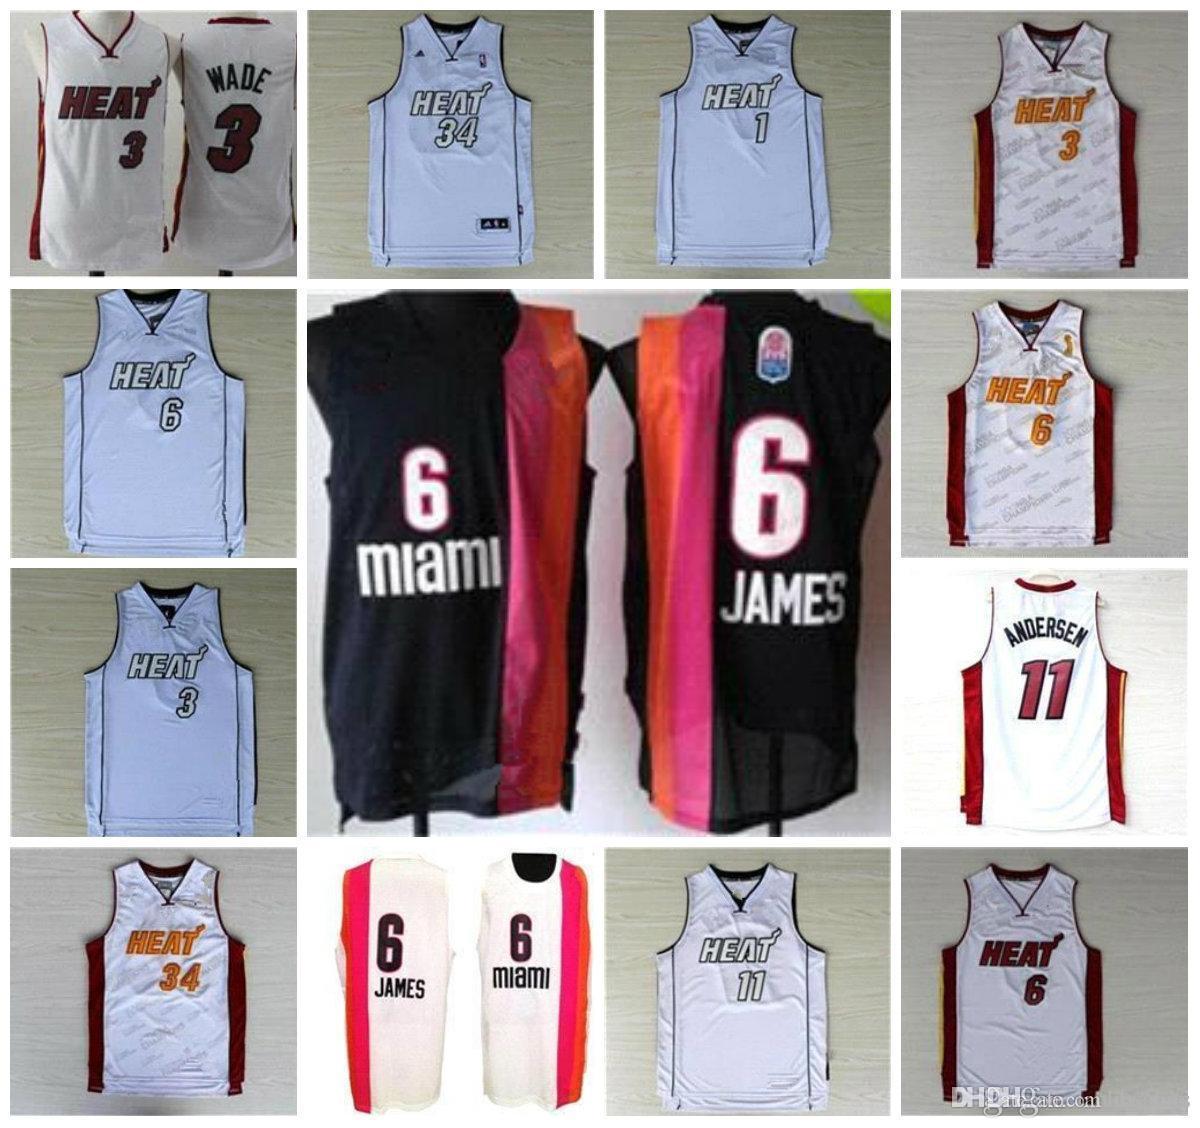 ... 2017 Miami Basketball Men Women Youth Jerseys Shorts Heat a33bb6a44